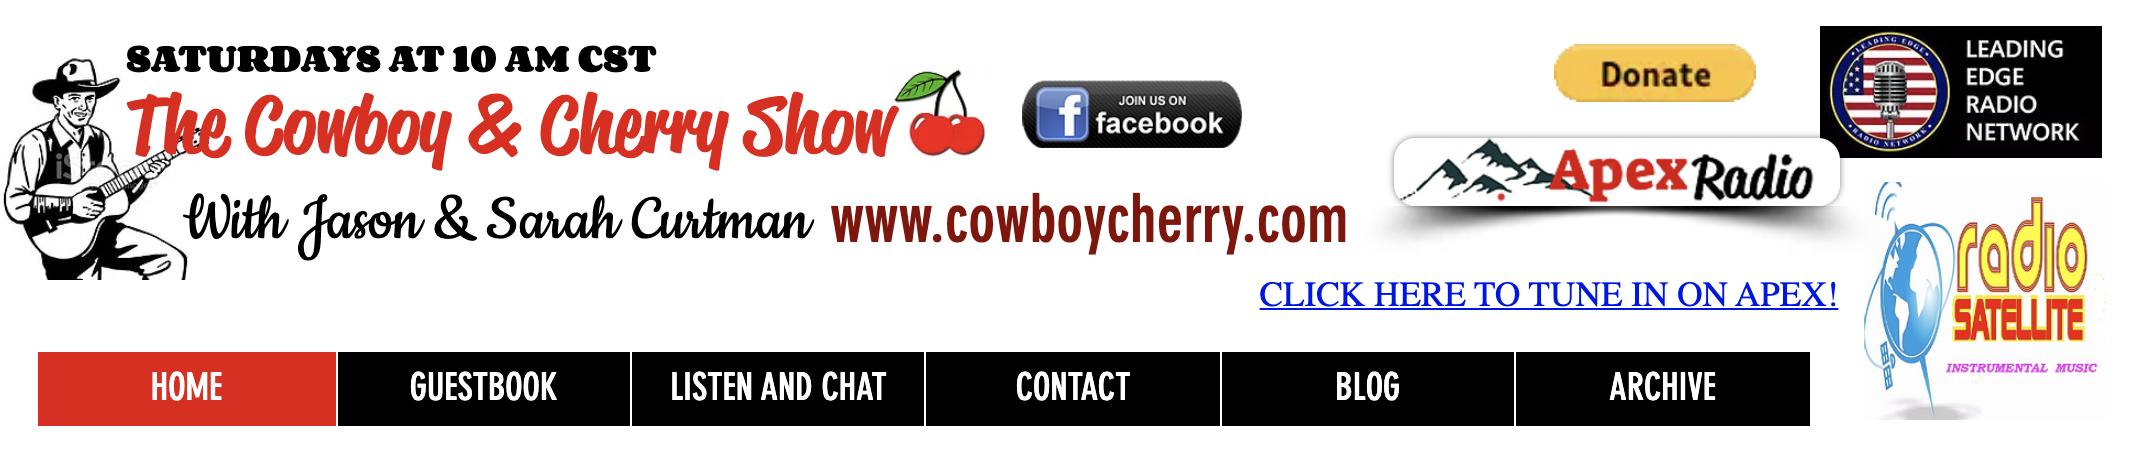 THE COWBOY & CHERRY SHOW